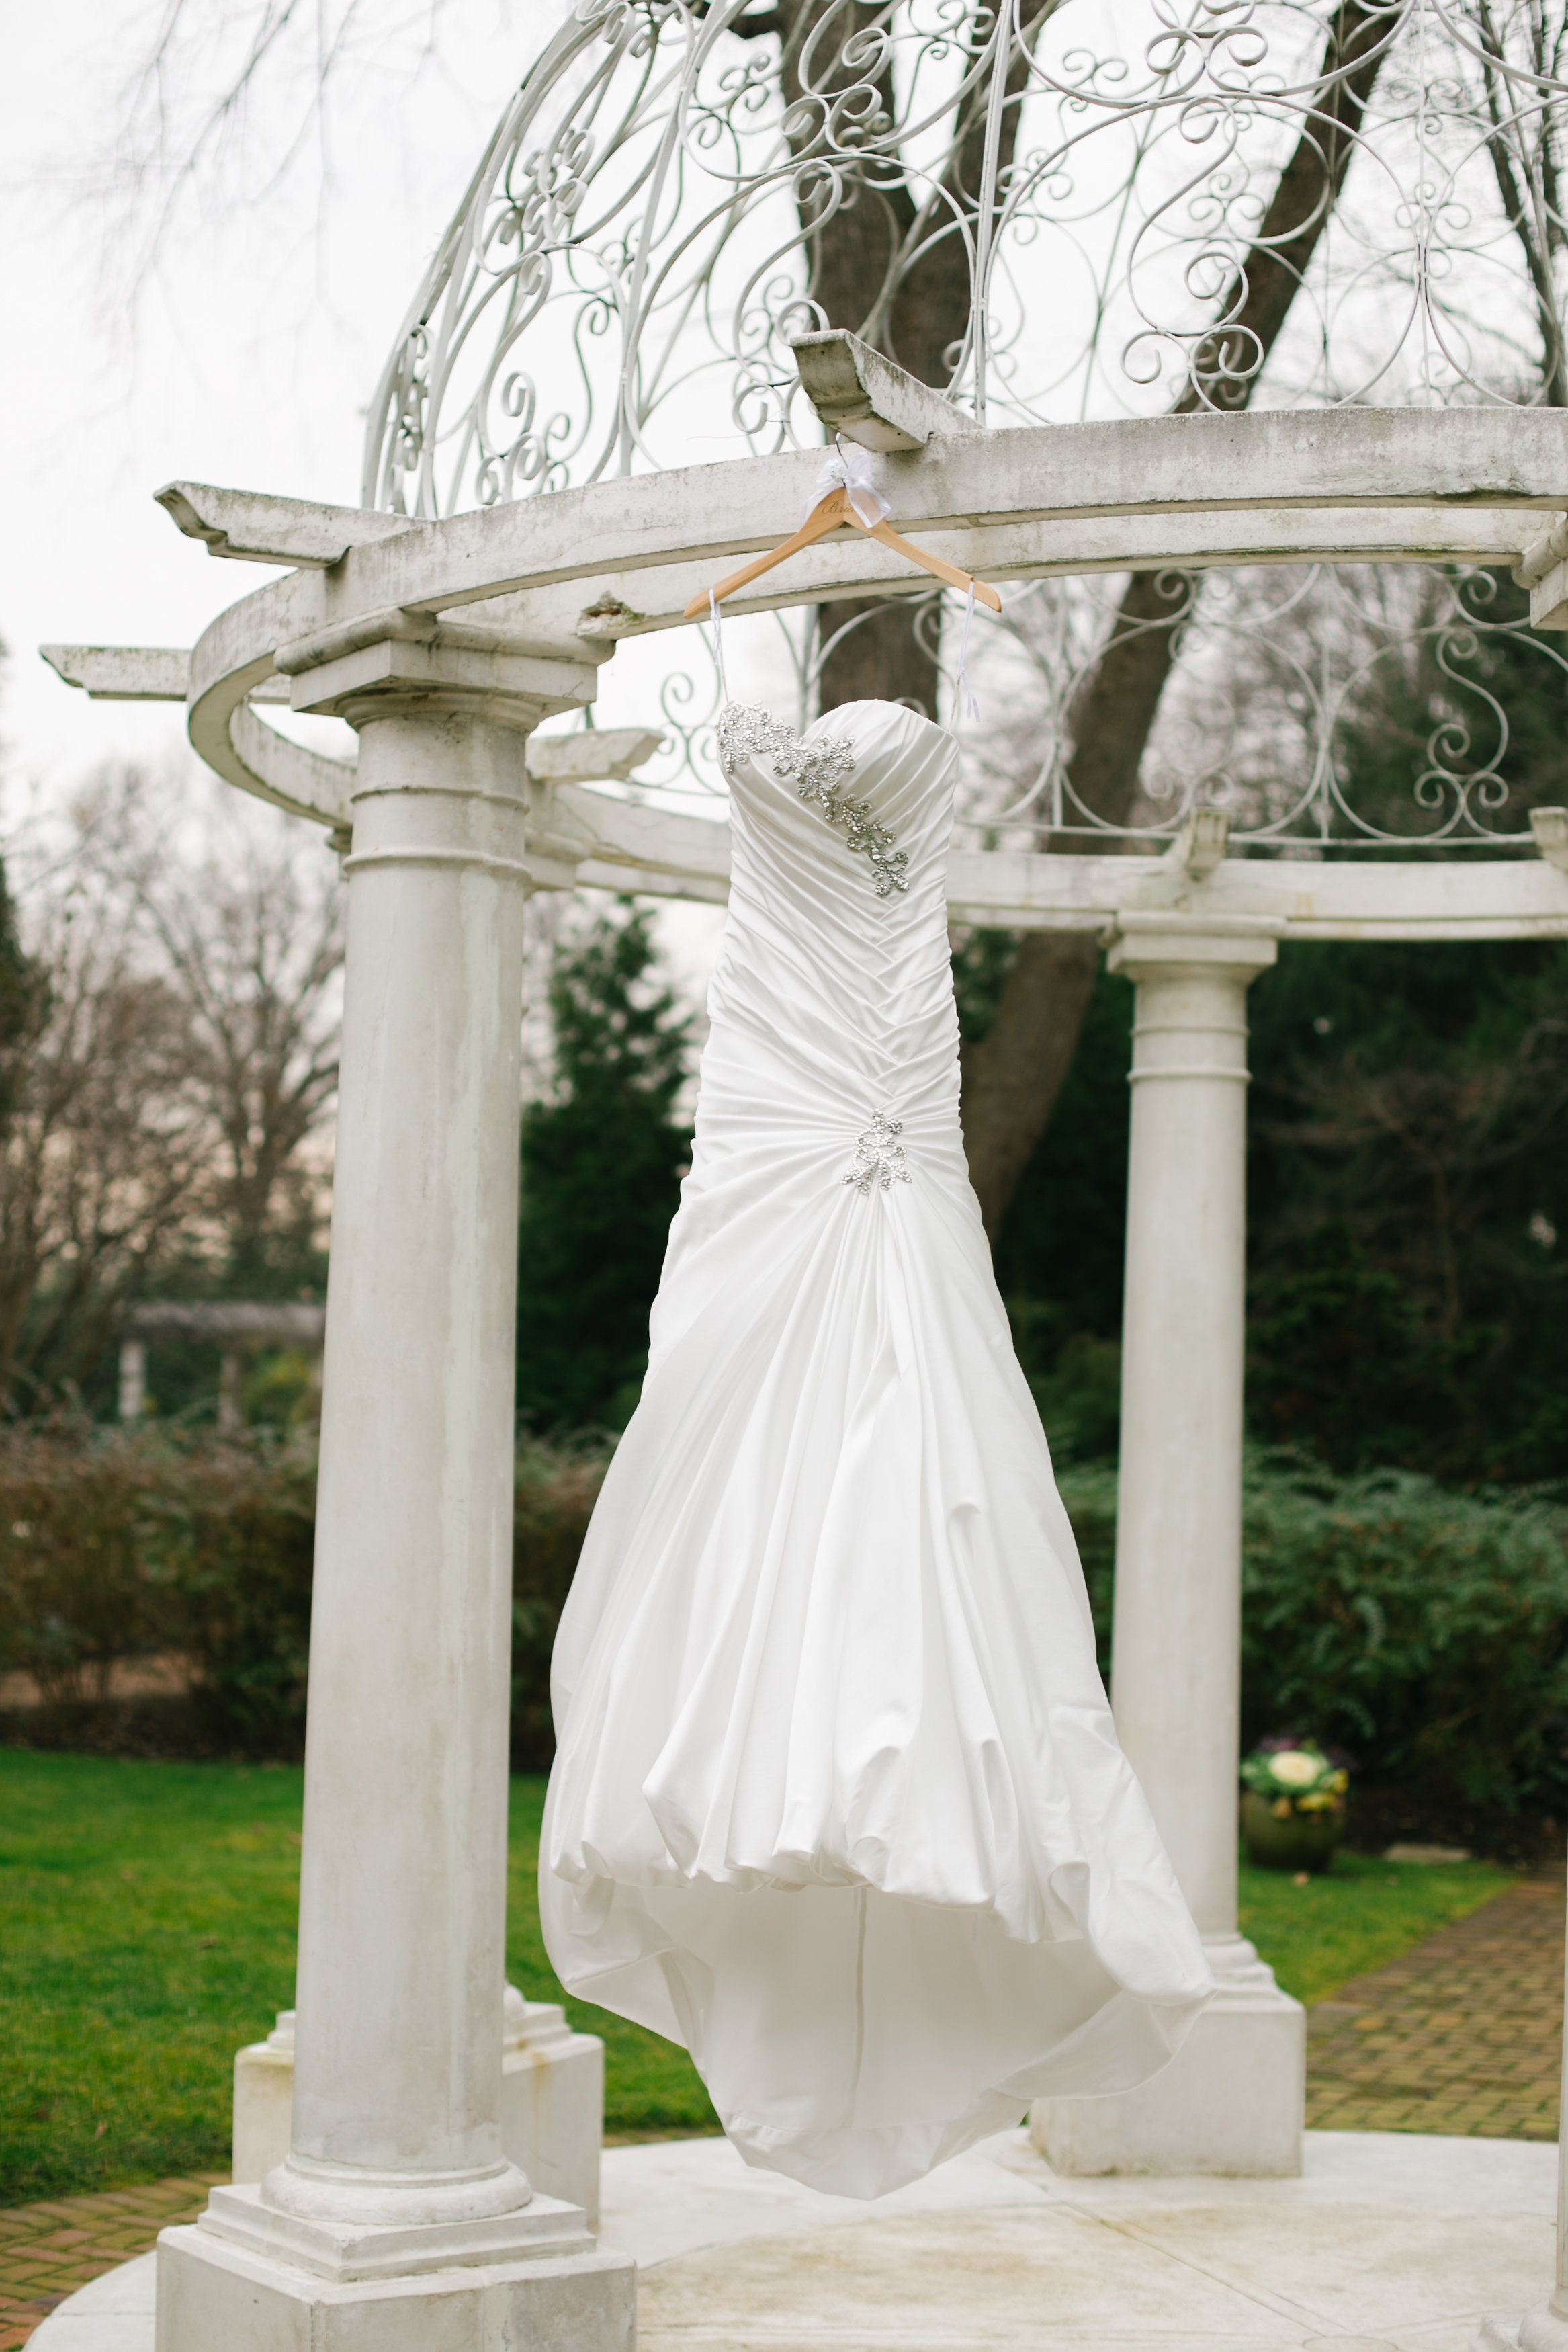 Ceci_New_York_Custom_Invitation_ New_Jersey_Wedding_Luxury_Personalized_Ceci_Style_Bride_Foil_Stamping2.jpg